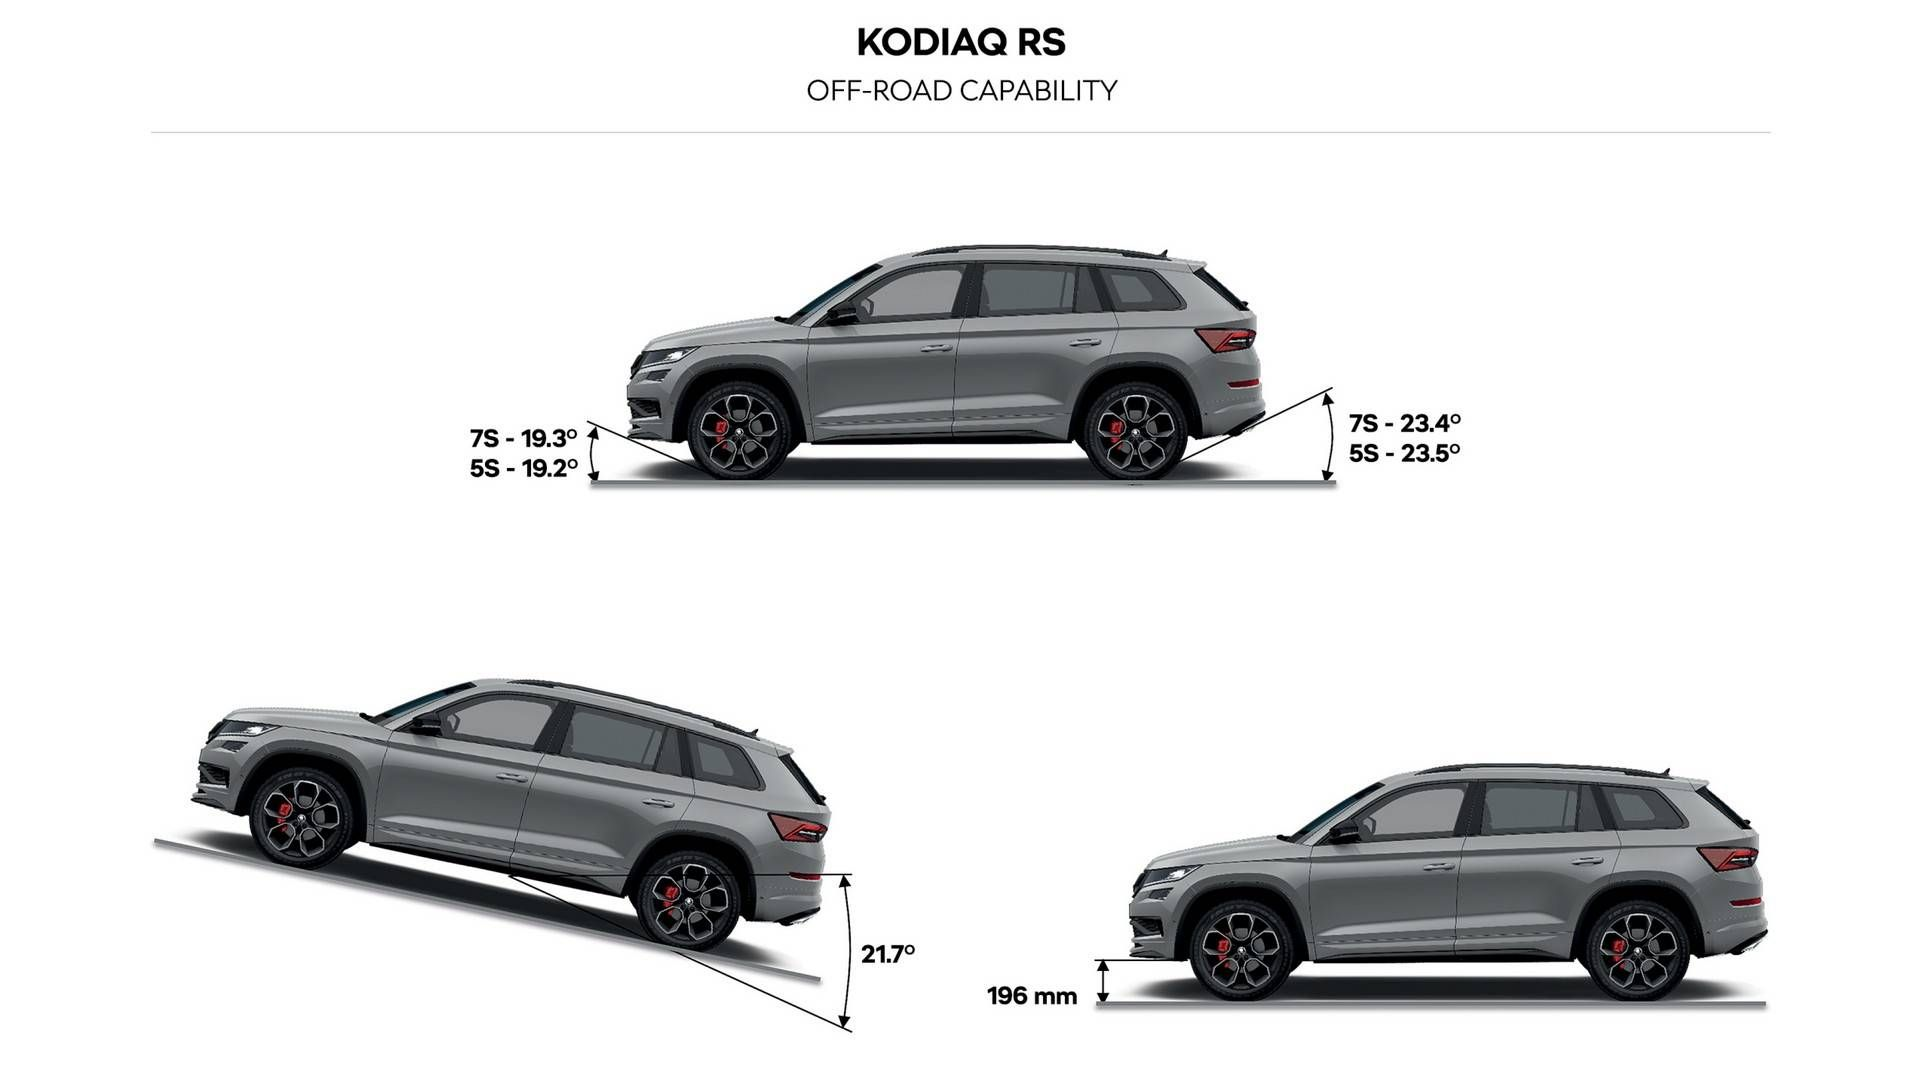 2019 Skoda Kodiaq Rs Motor1 Com Photos In 2020 Skoda Kodiaq Skoda Photo